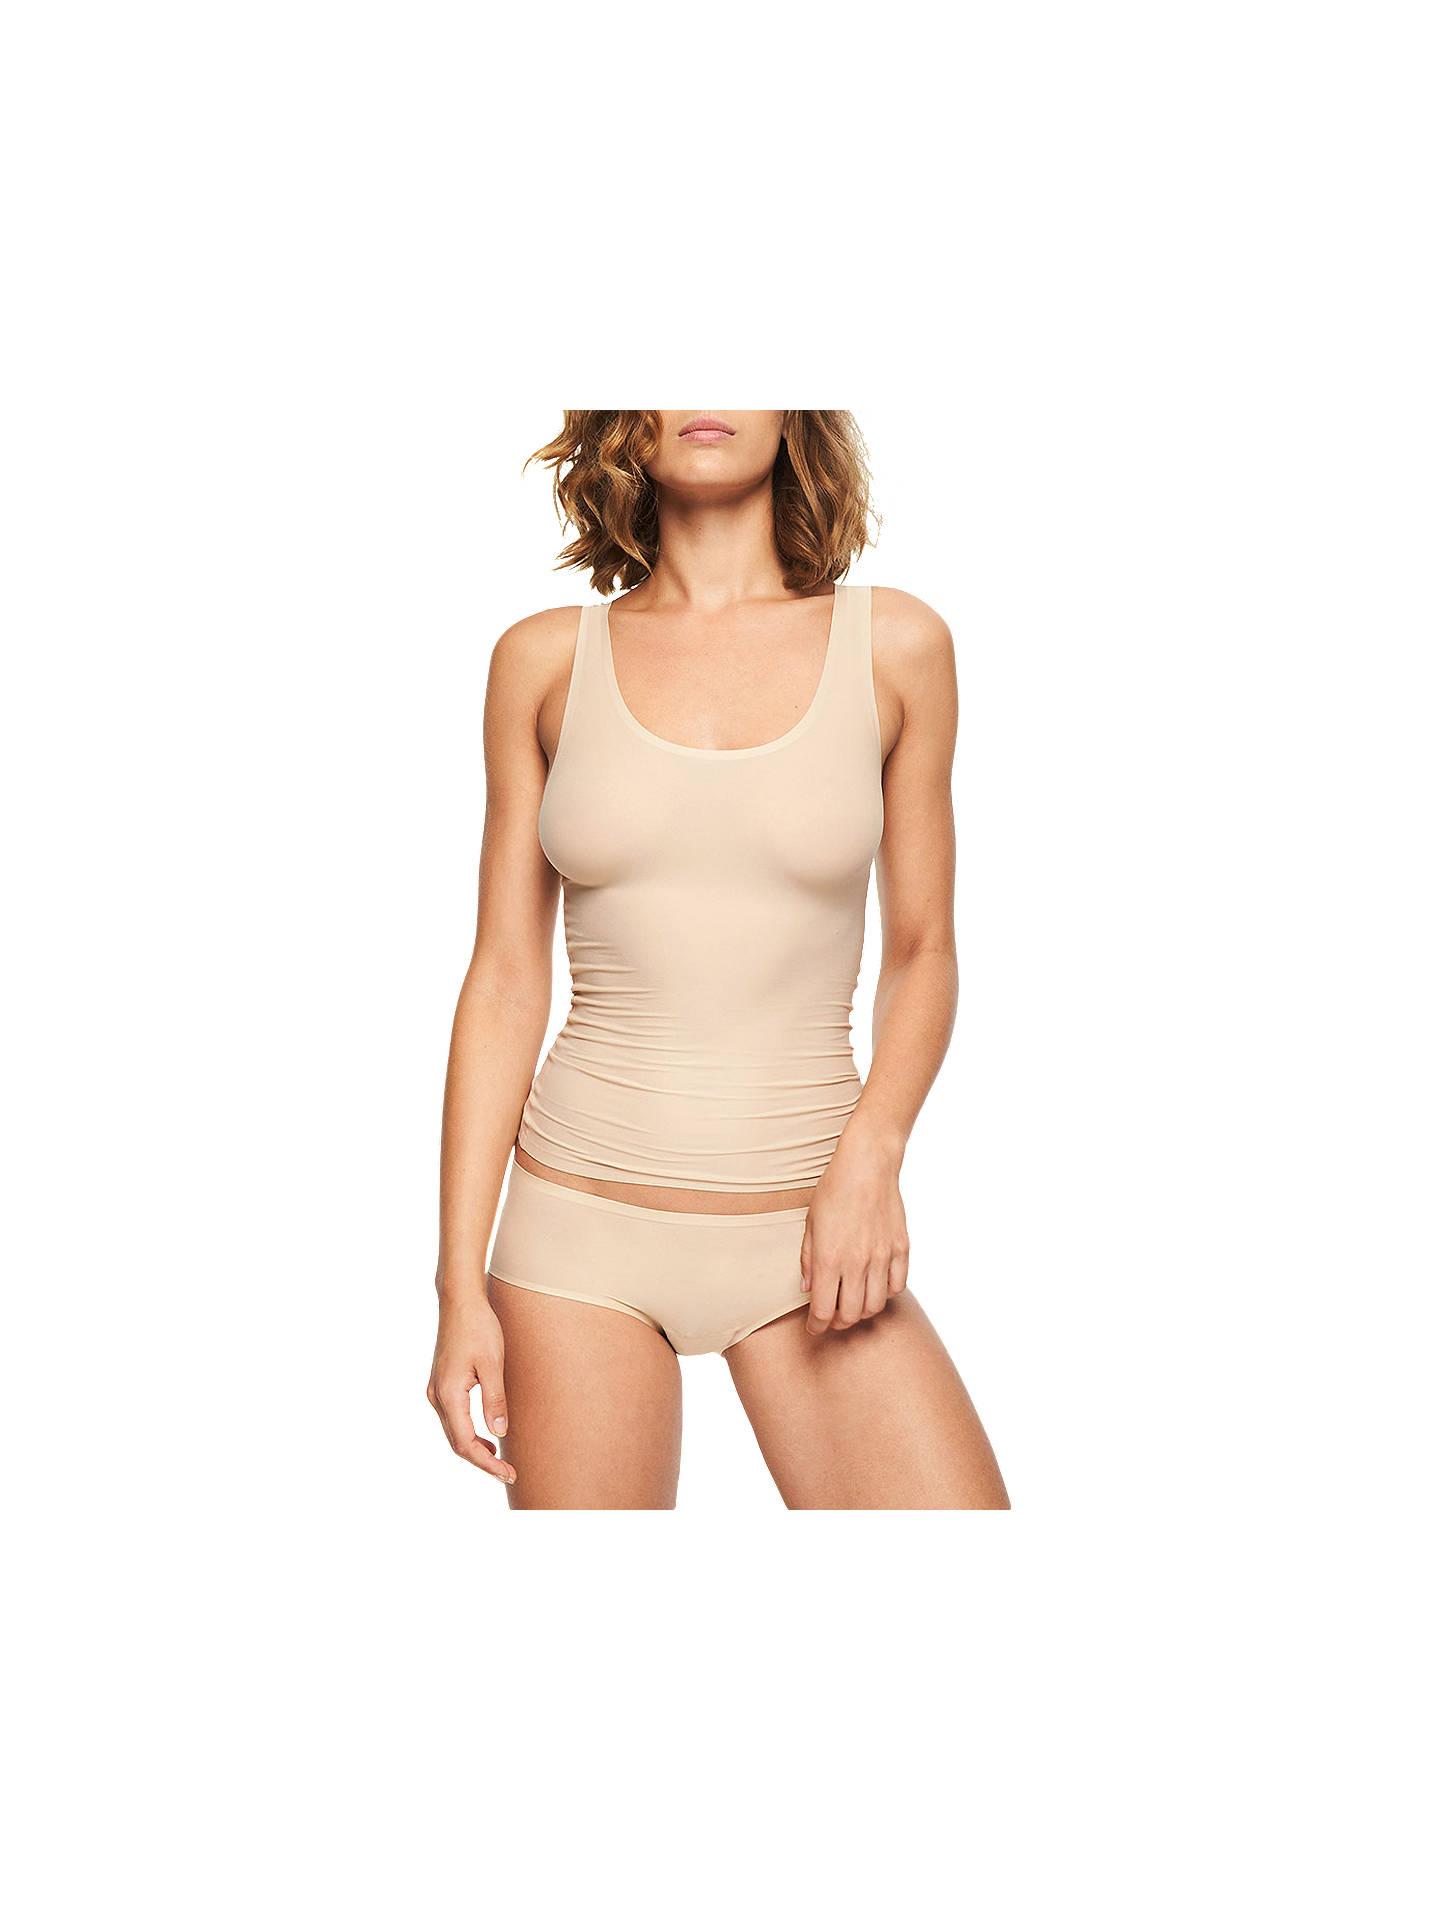 64992ef43eff Buy Chantelle Soft Stretch Vest, Nude, One Size Online at johnlewis.com ...